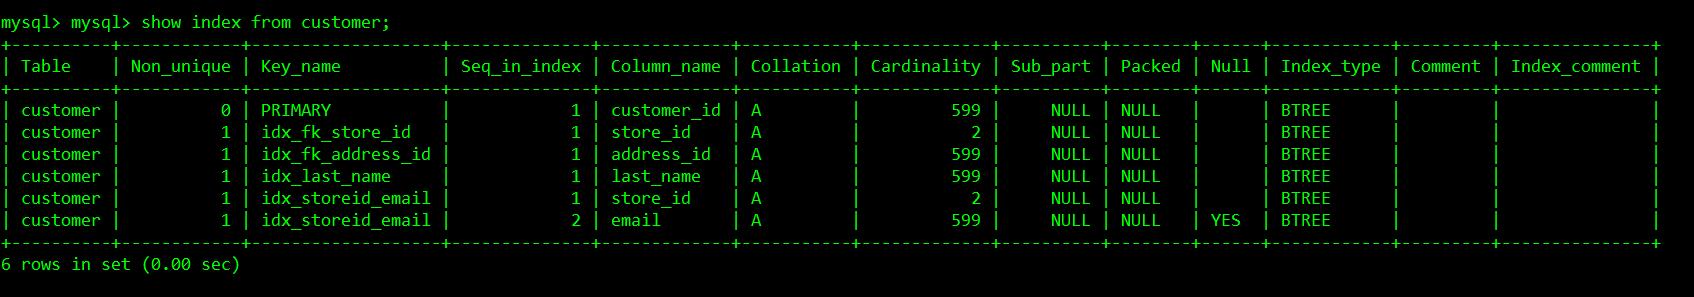 Mysql优化orderby语句的办法 <em style='color:red;'>详解</em>